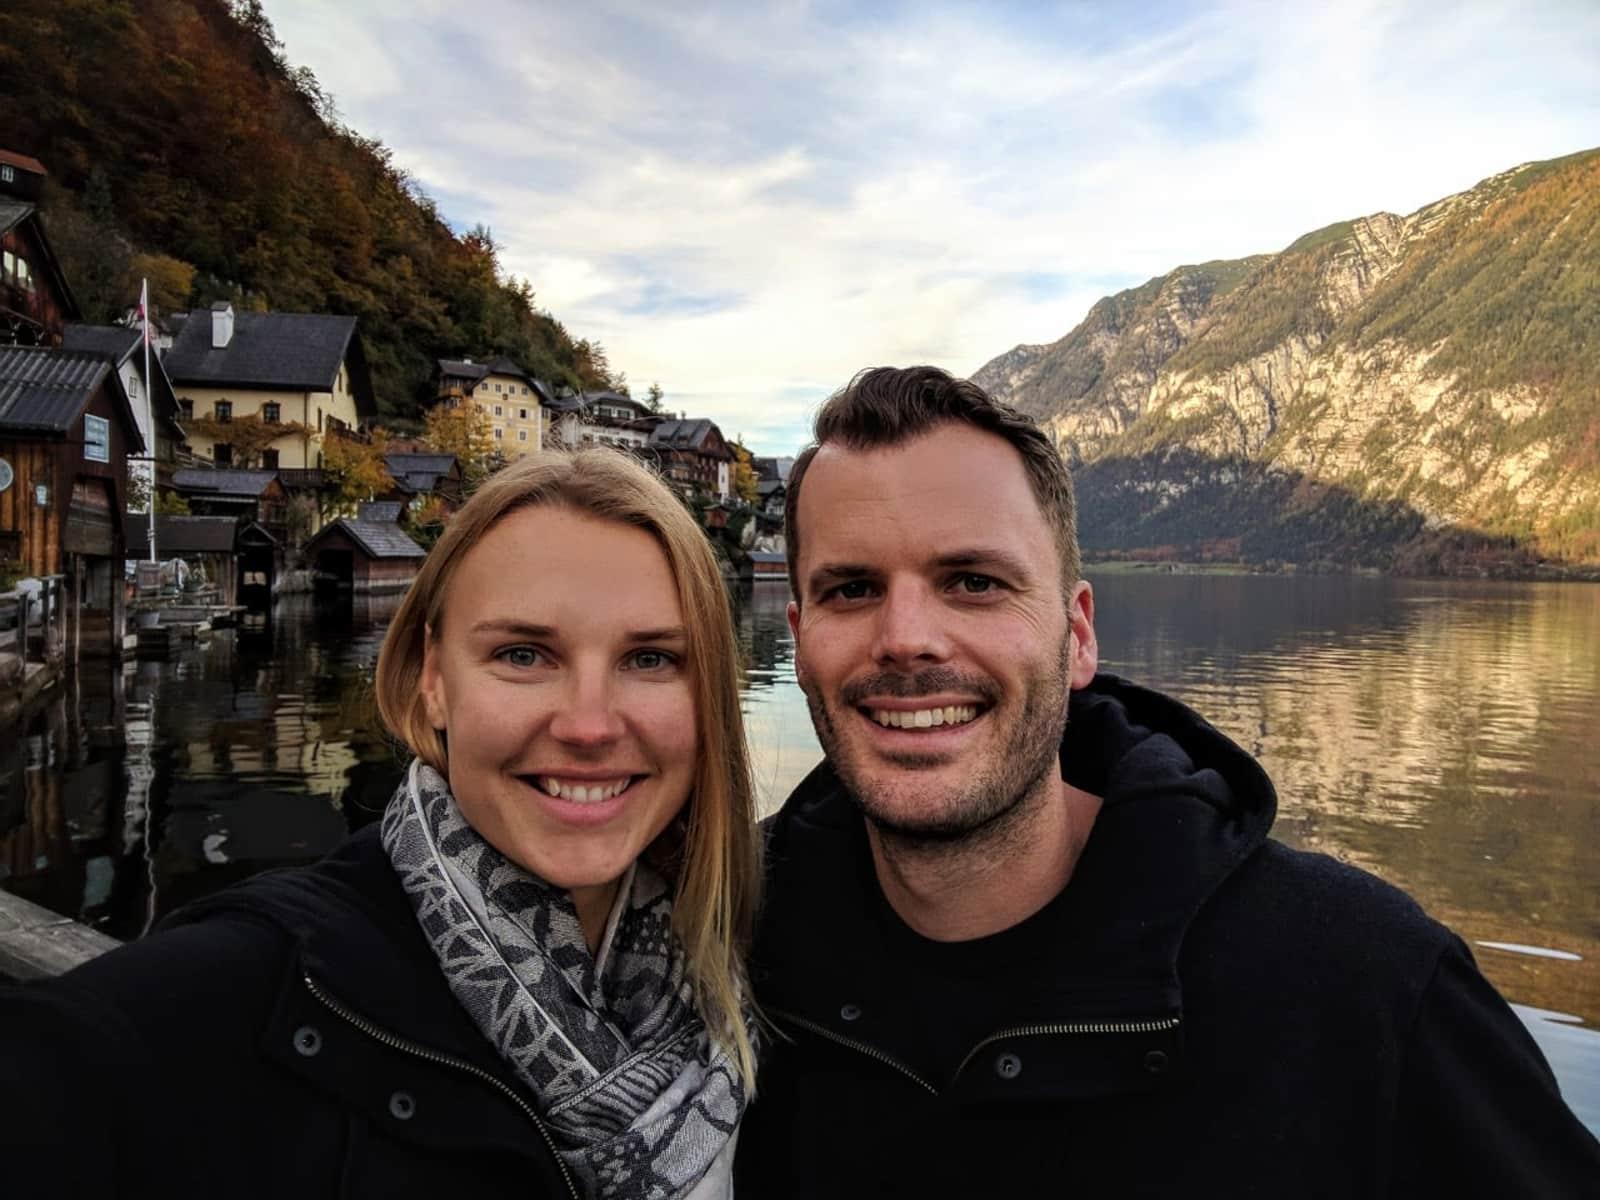 Derek & Holly from Auckland, New Zealand